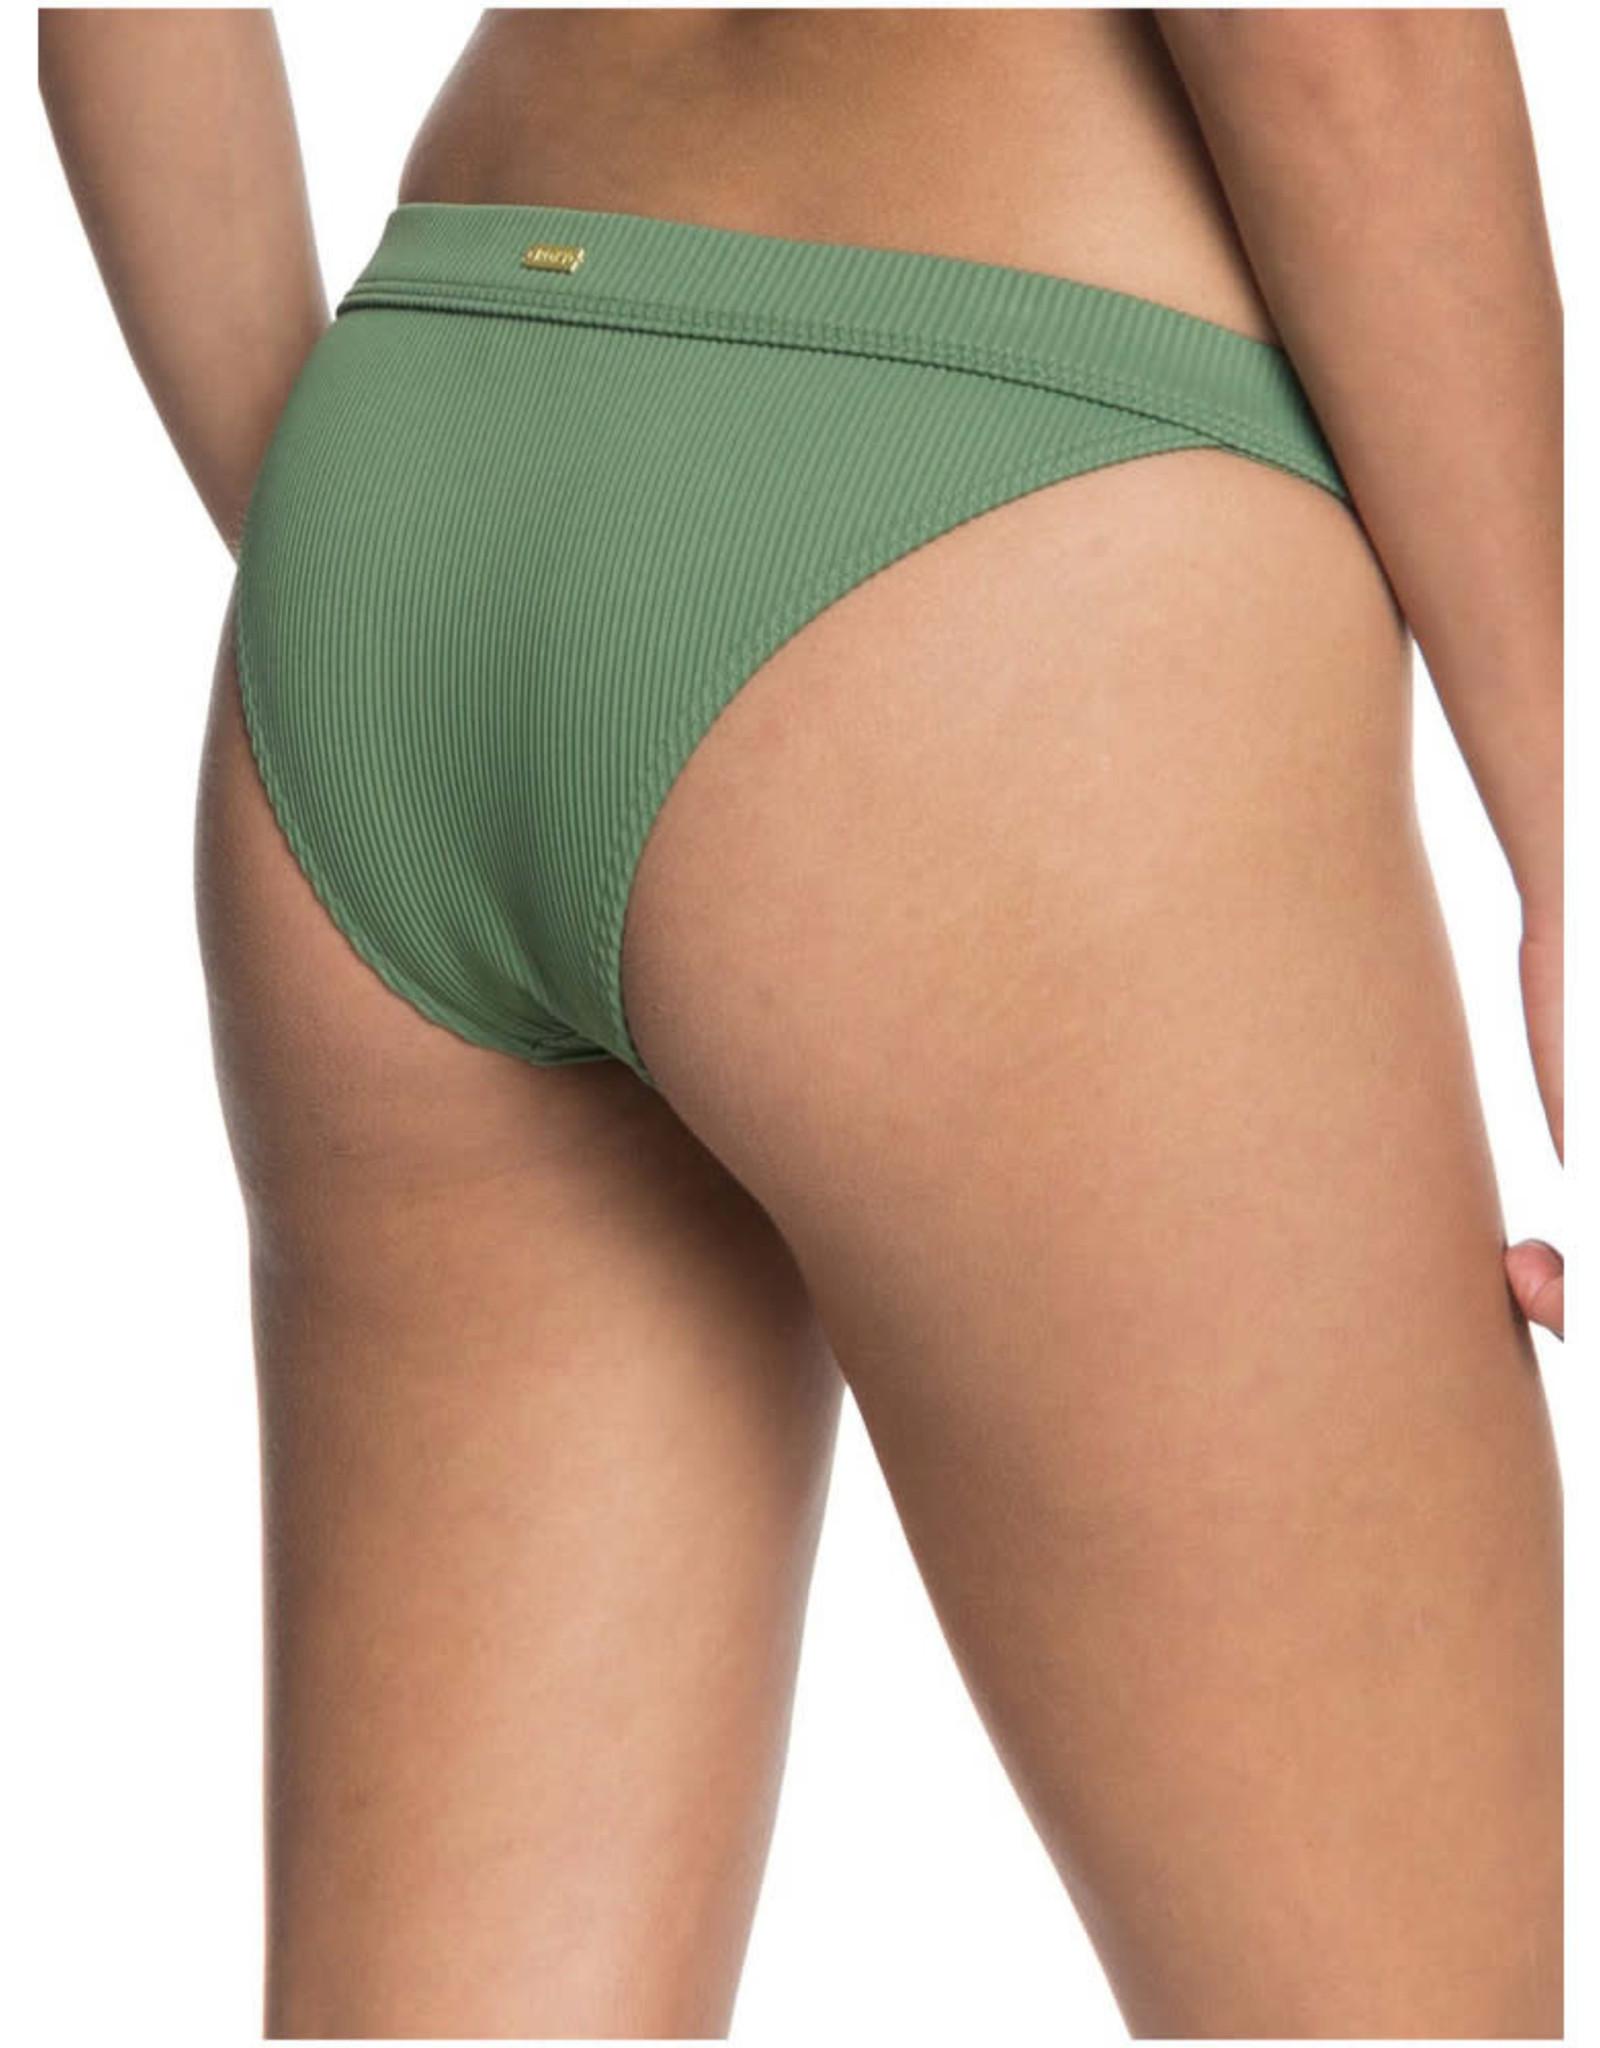 ROXY Mind Of Freedom Regular Bikini Bottom - Size L